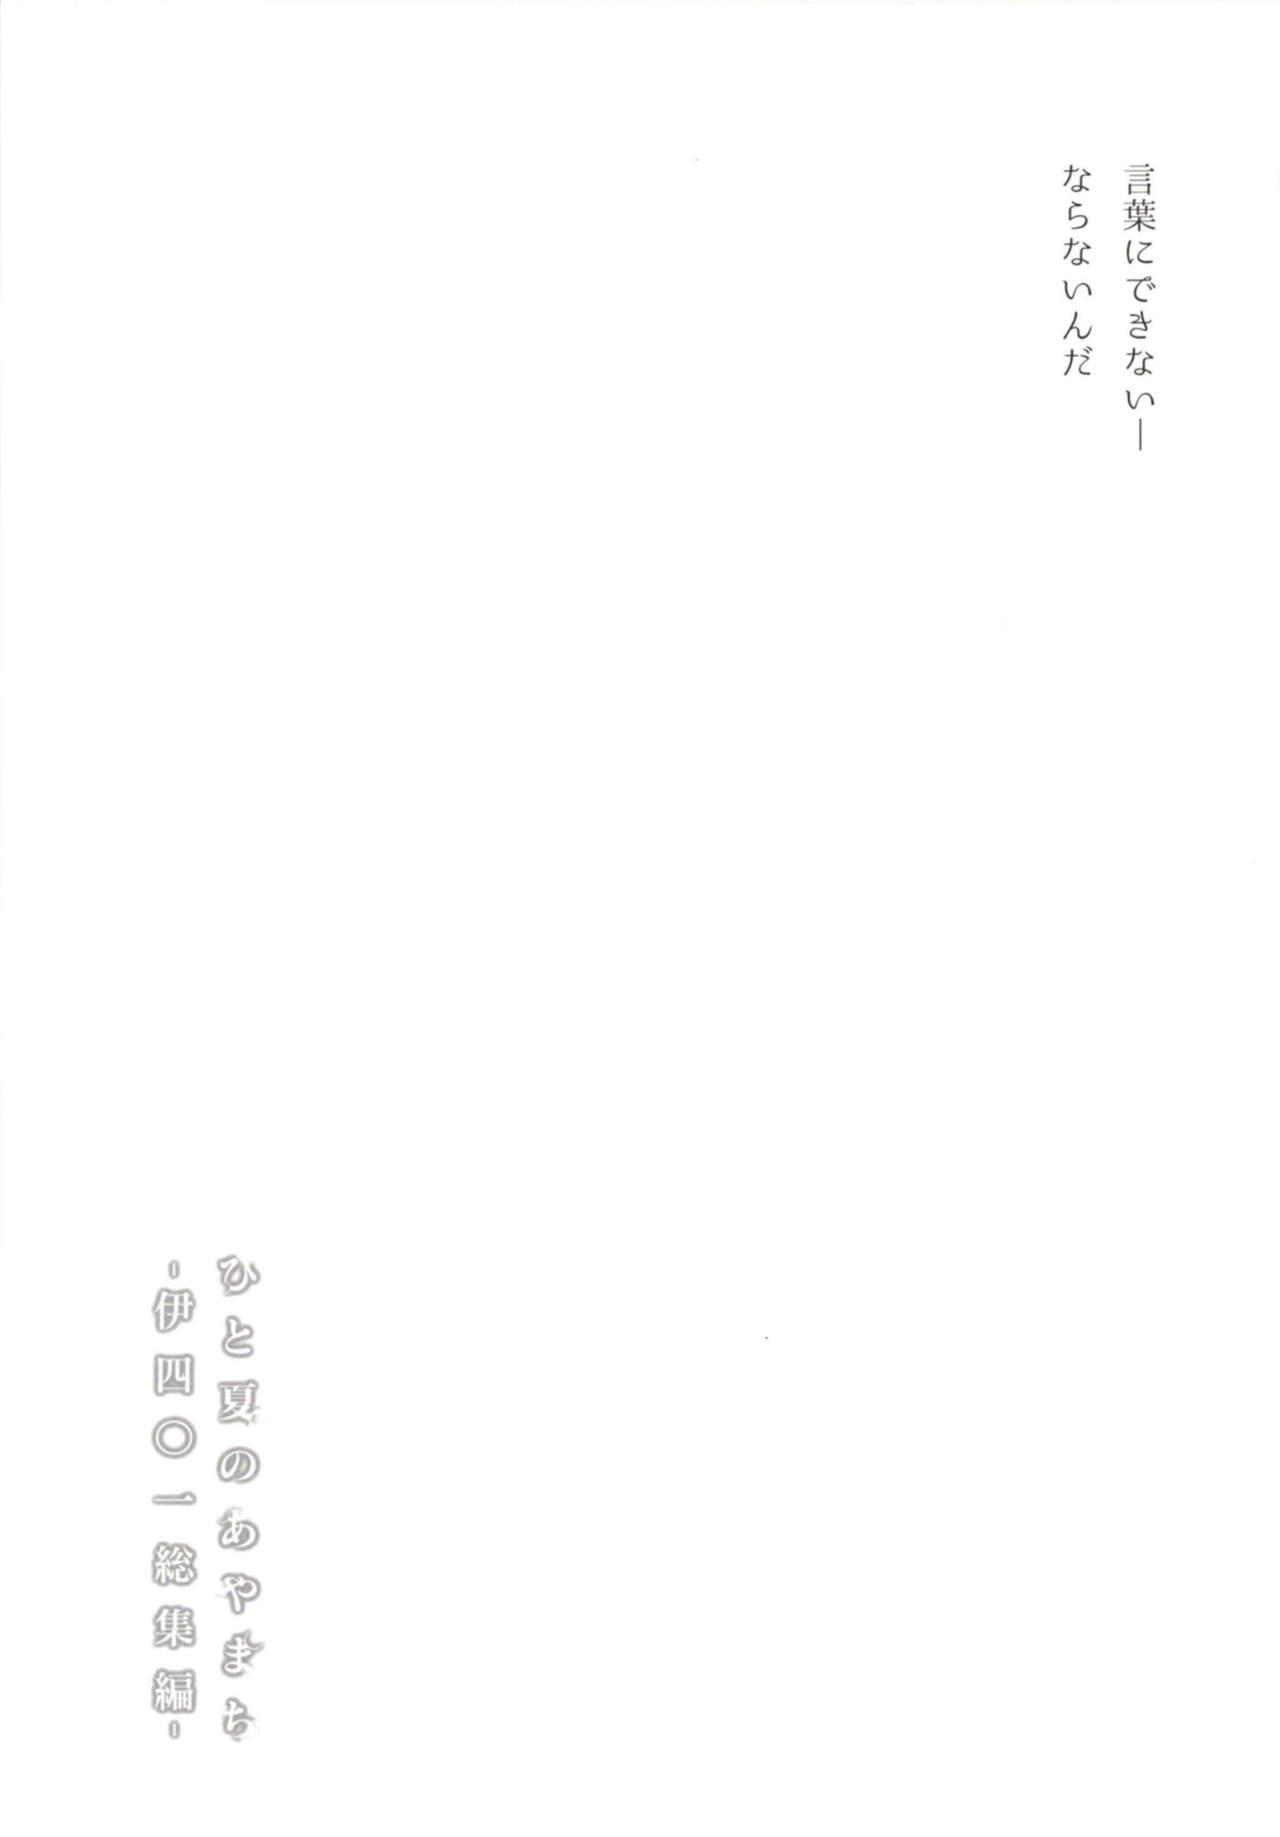 [French letter (Fujisaki Hikari)] Hitonatsu no Ayamachi -I-401 Soushuuhen- (Kantai Collection -KanColle-) [Chinese] [Digital] 58